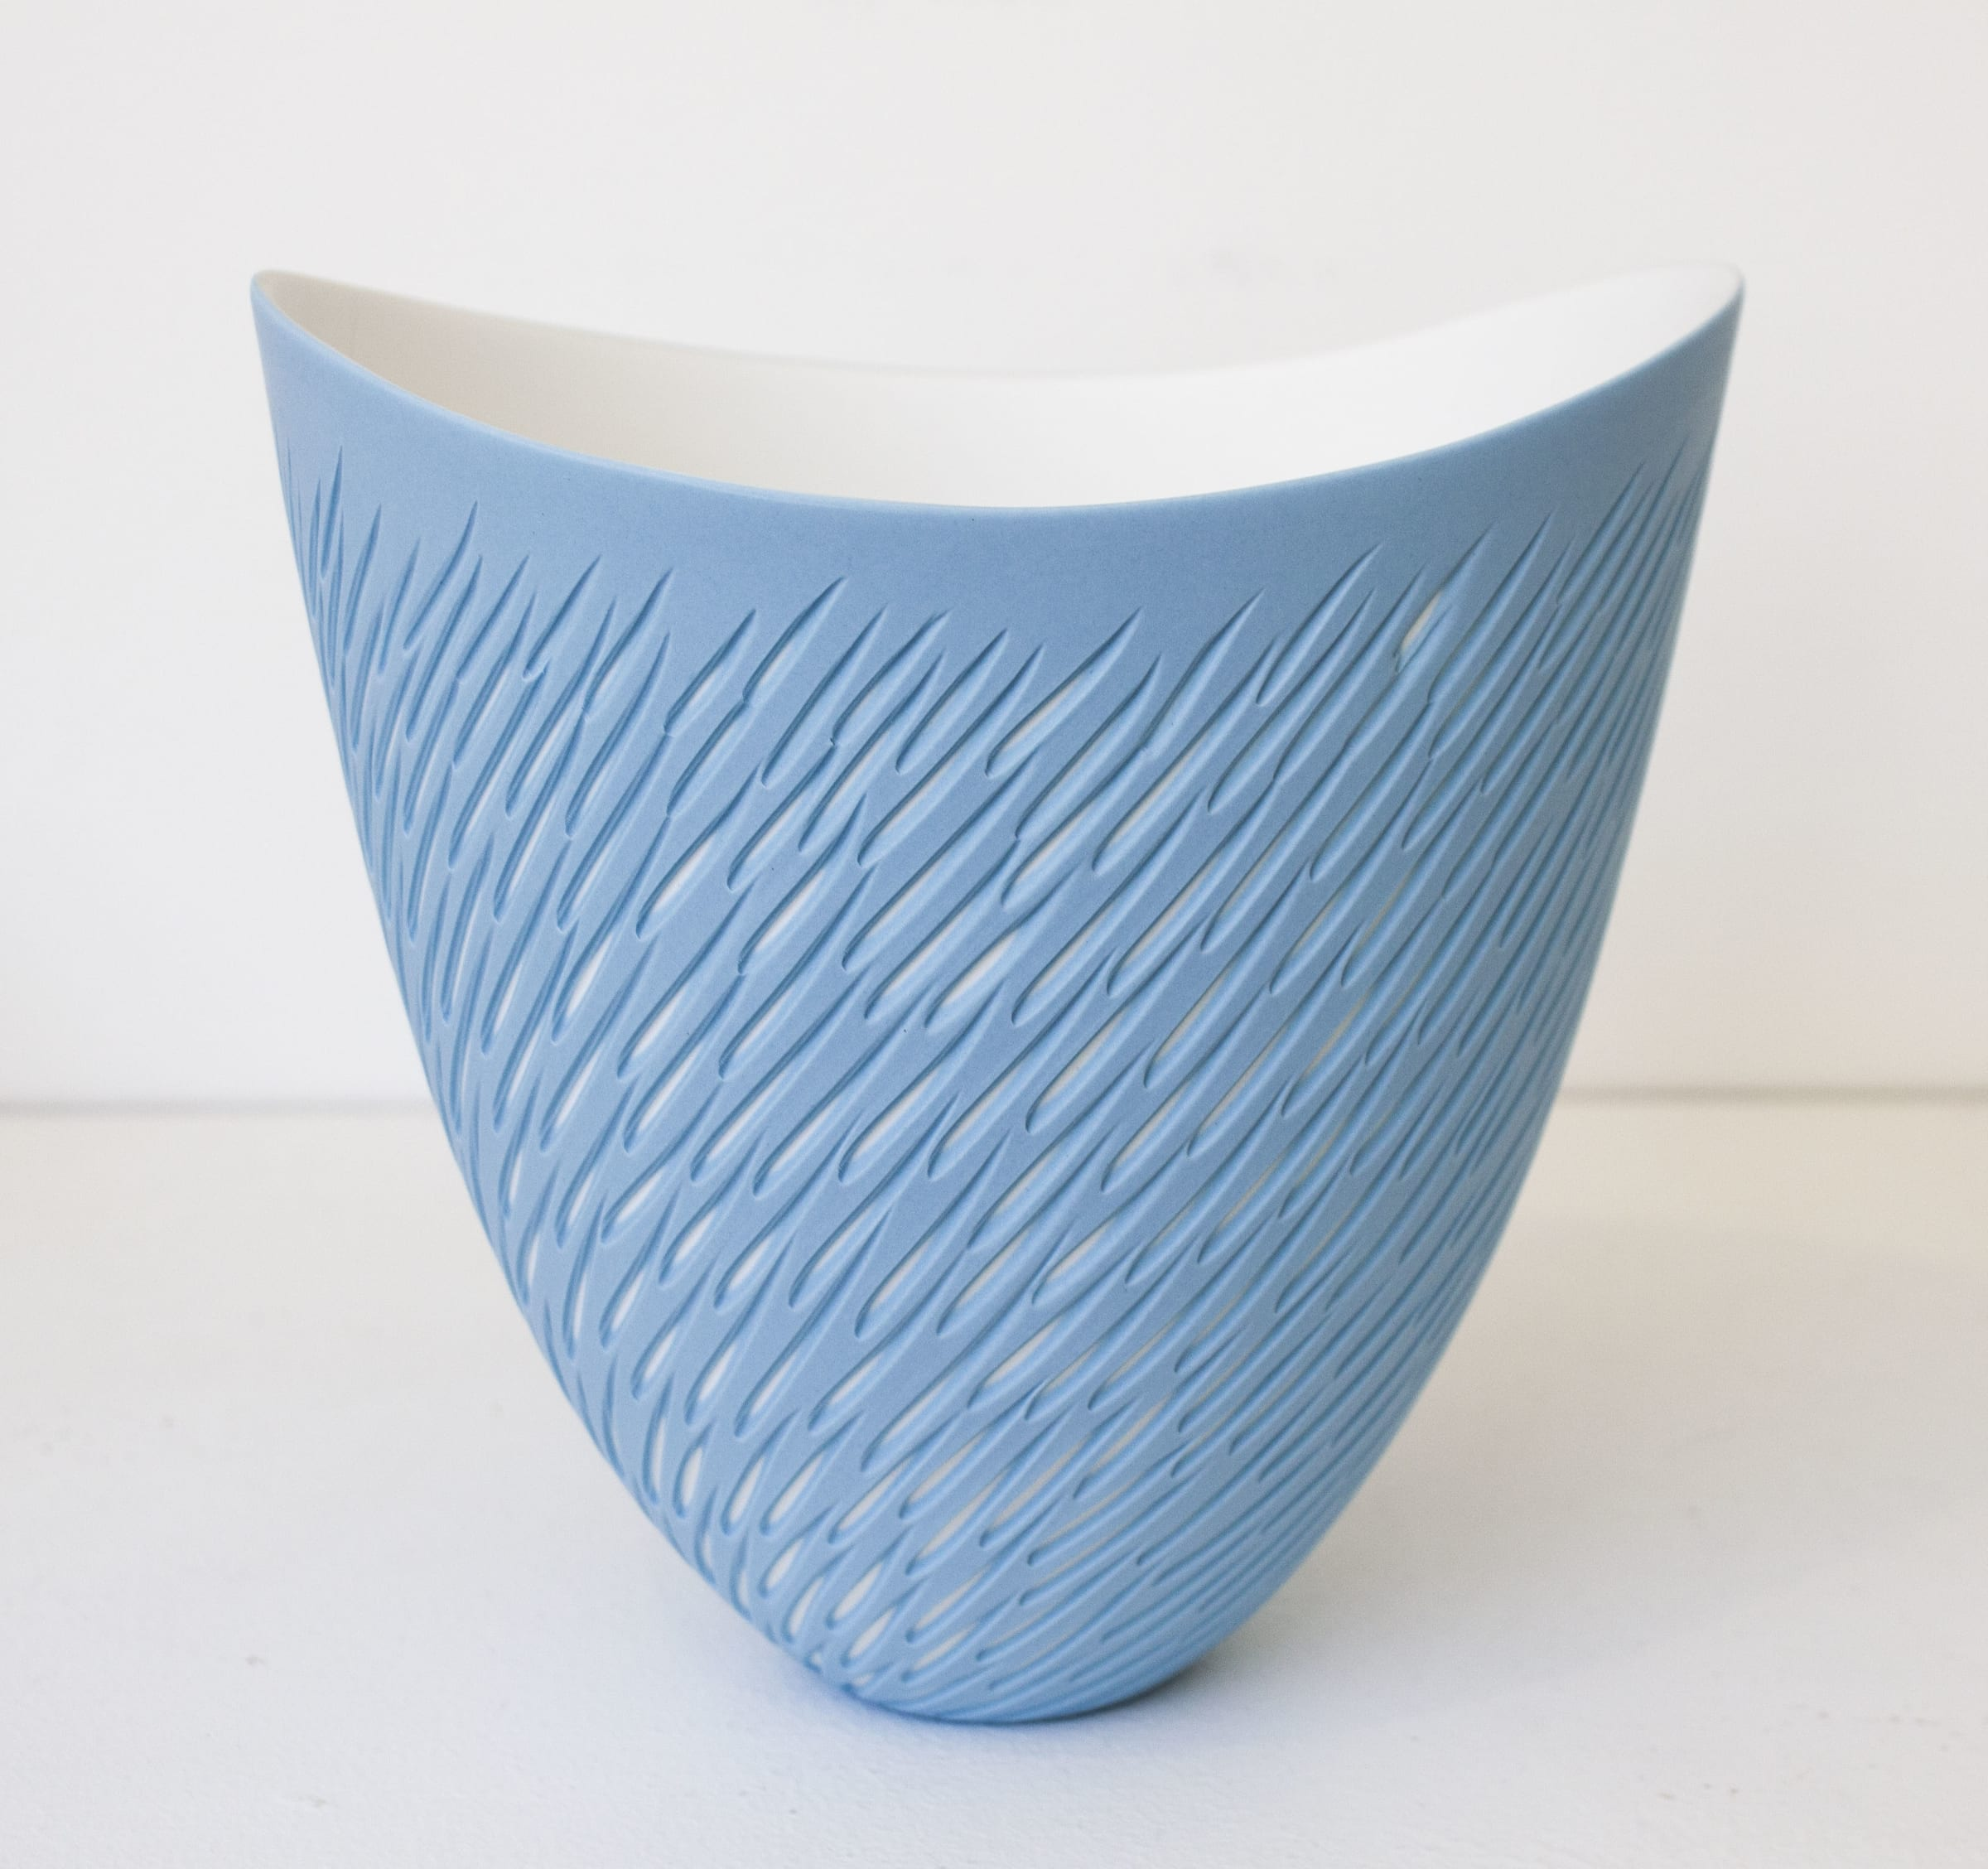 "<span class=""link fancybox-details-link""><a href=""/artists/60-sasha-wardell/works/7785-sasha-wardell-blue-shoal-curved-rim-vase-2021/"">View Detail Page</a></span><div class=""artist""><strong>Sasha Wardell</strong></div> <div class=""title""><em>Blue 'Shoal' Curved Rim Vase</em>, 2021</div> <div class=""medium"">bone china</div> <div class=""dimensions"">h. 16 cm</div><div class=""price"">£210.00</div><div class=""copyright_line"">Own Art: £21 x 10 Months, 0% APR</div>"